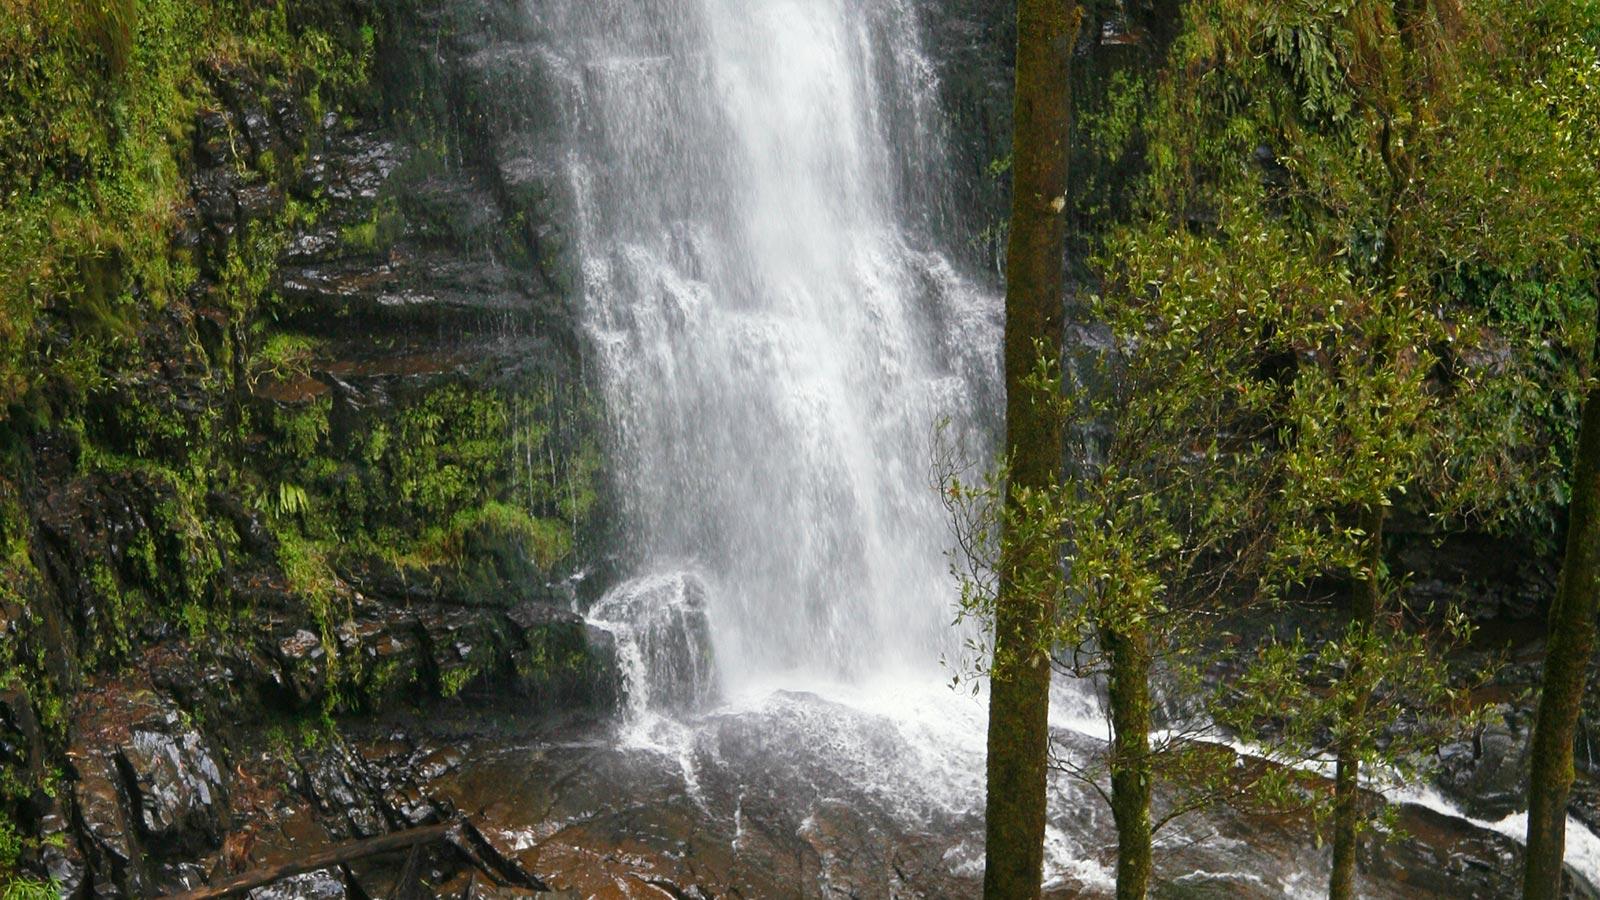 Erskine Falls, Lorne, Great Ocean Road, Victoria, Australia